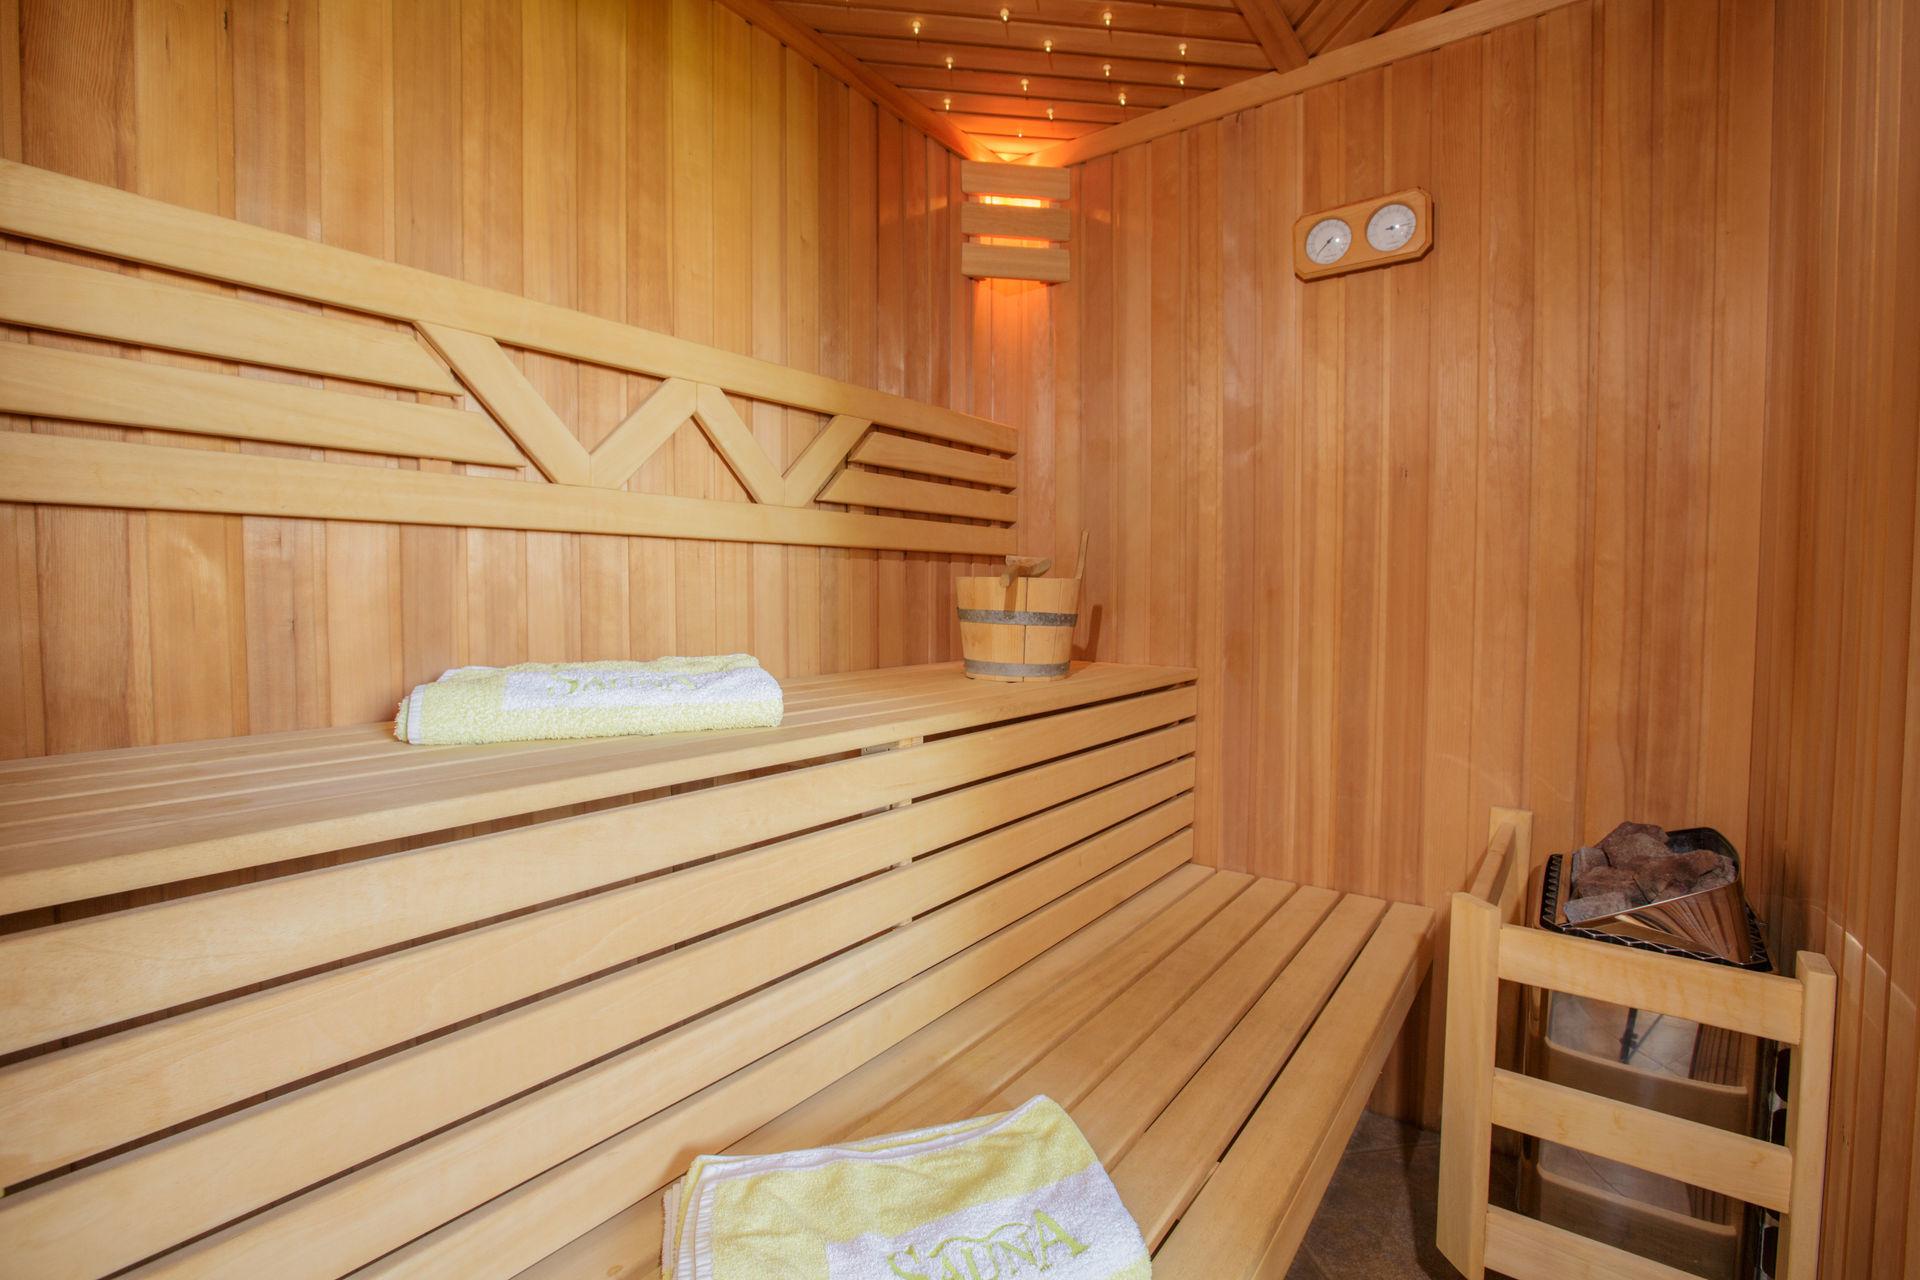 Sauna met sterrenhemel - Klaproos